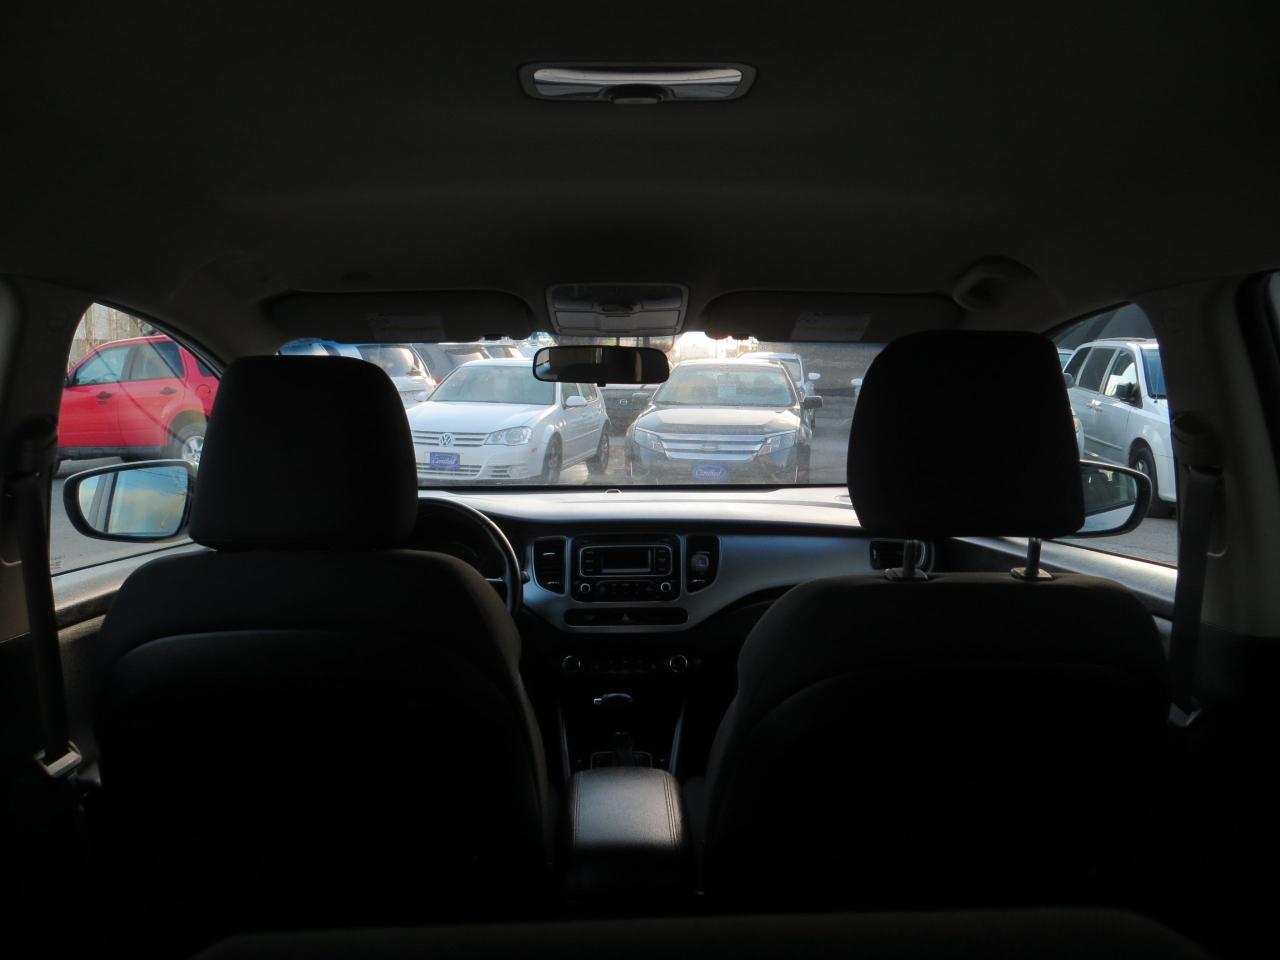 2016 Kia Rondo AUTOMATIC,BLUETOOTH,ALLOYS,HEATED SEATS,ALL POWER